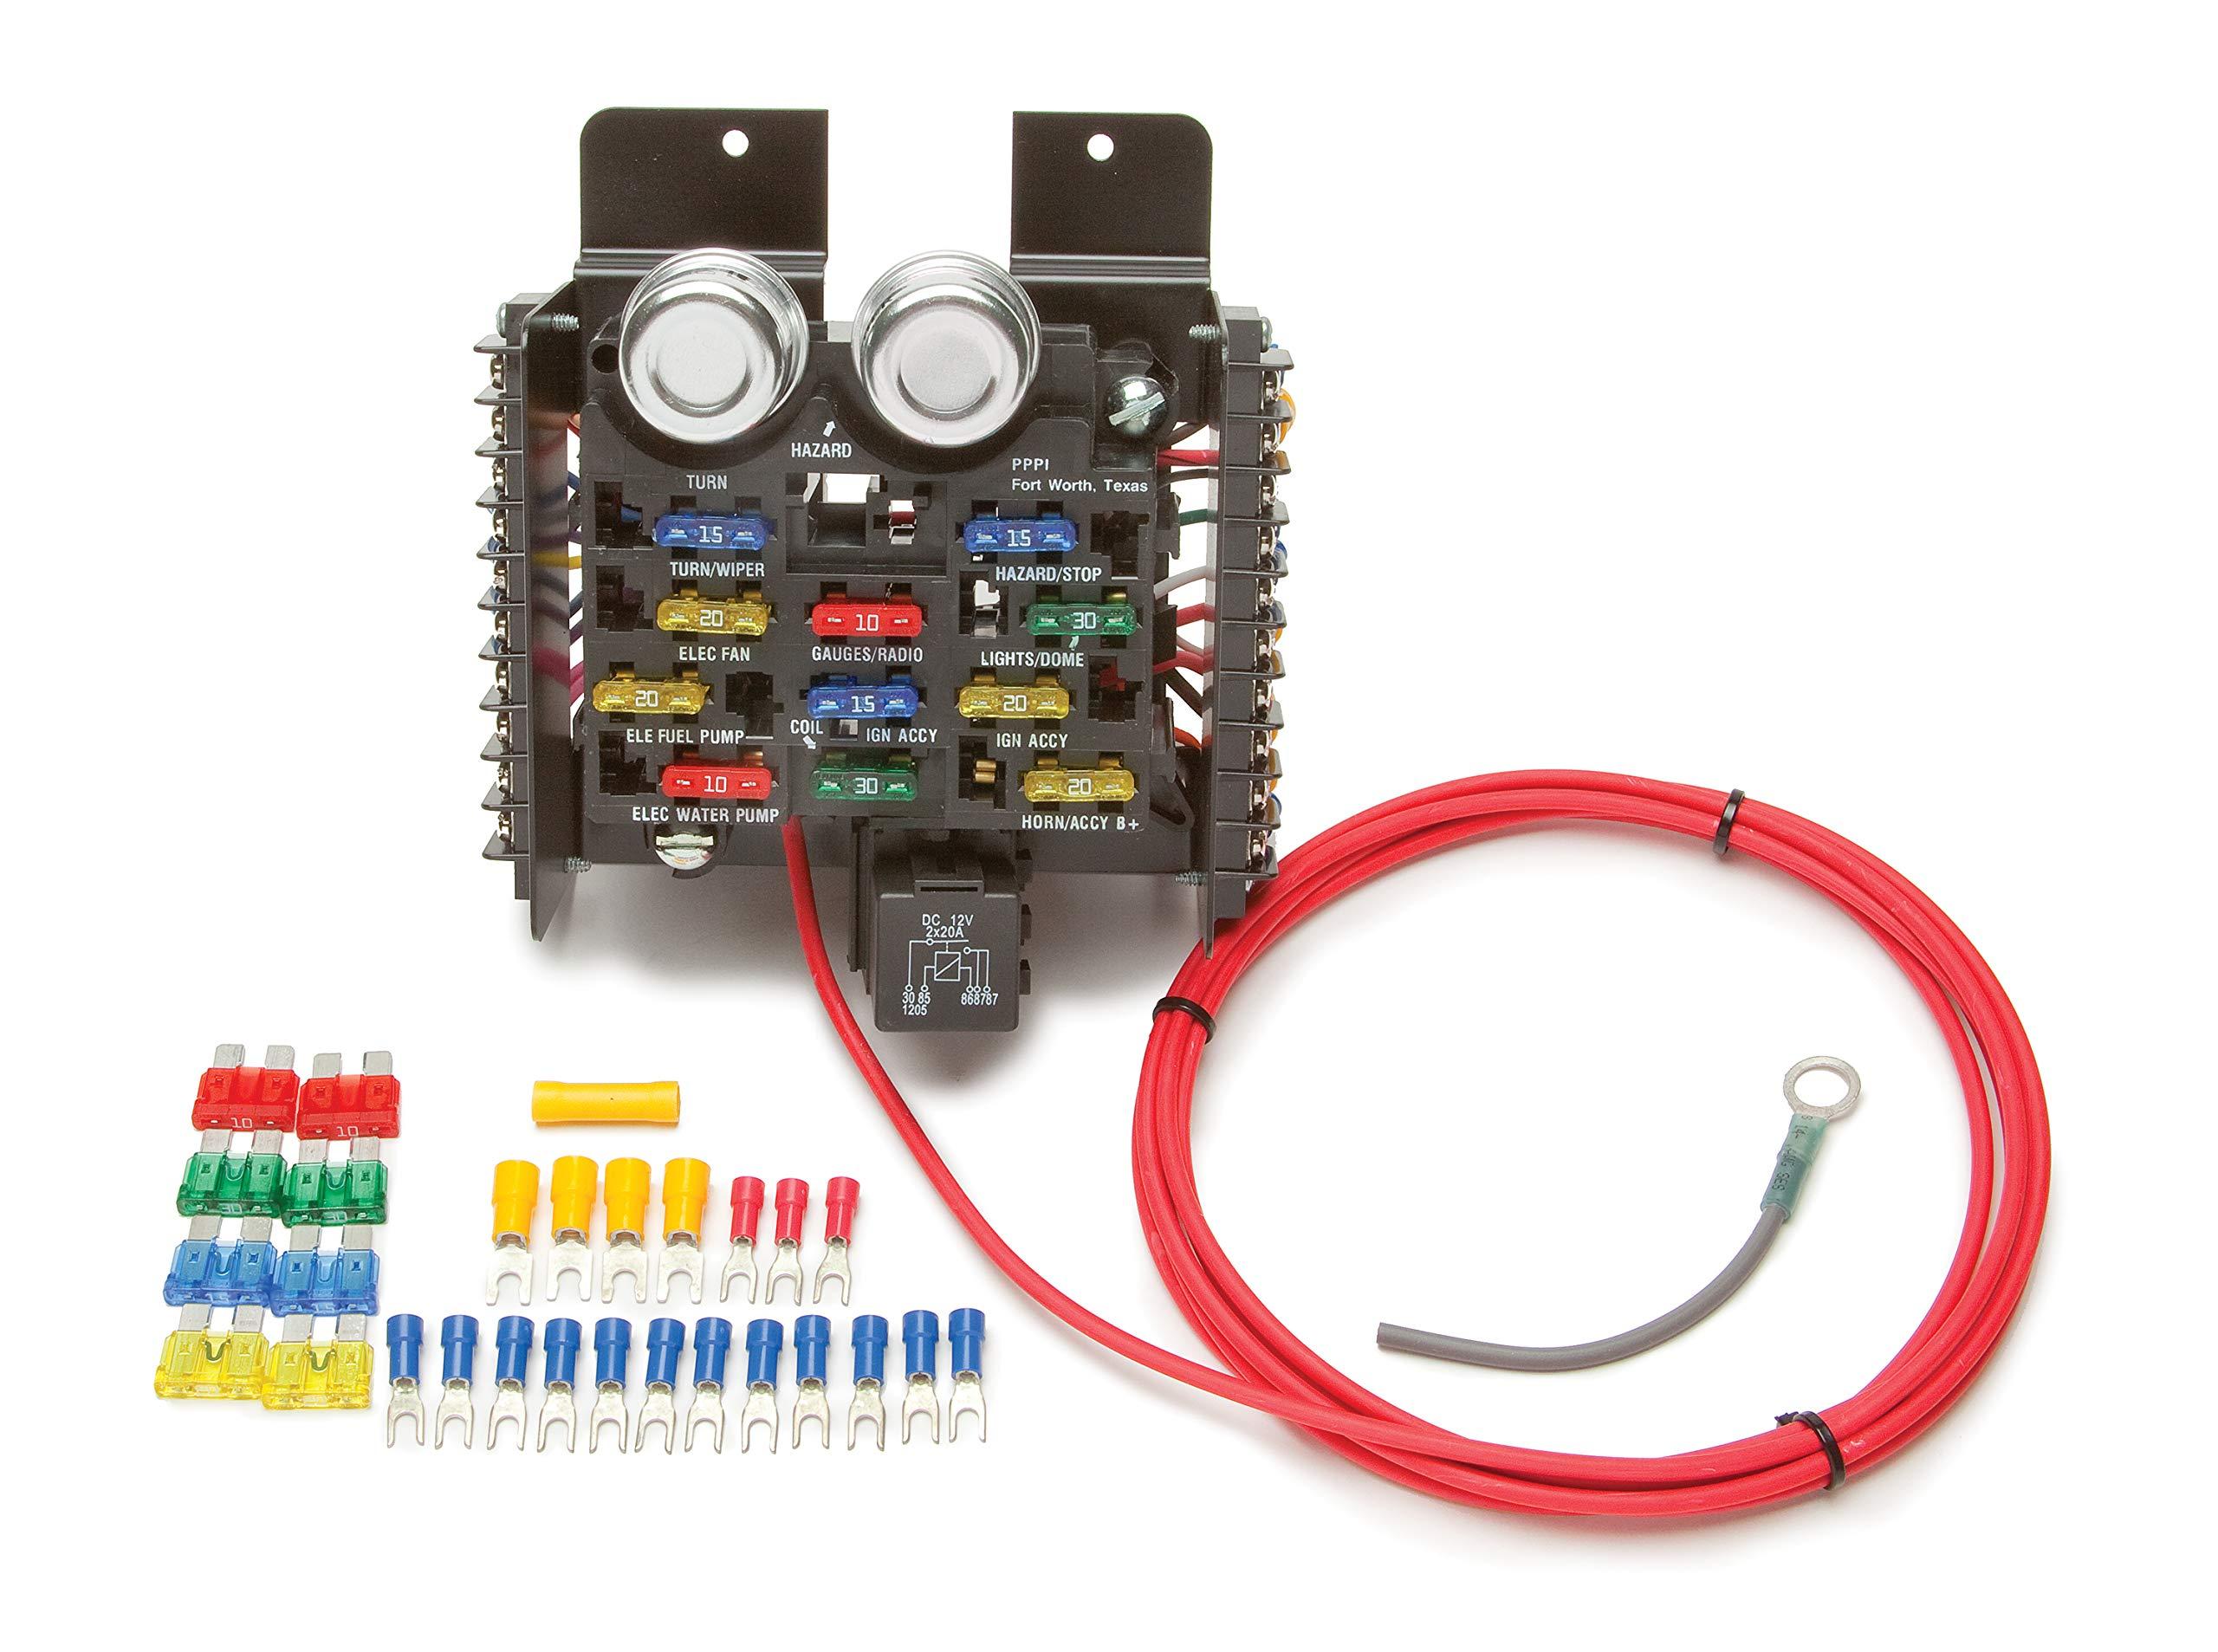 amazon.com: painless performance 50101 race/pro street pre-wired fuse block,  16-circuits : automotive  amazon.com